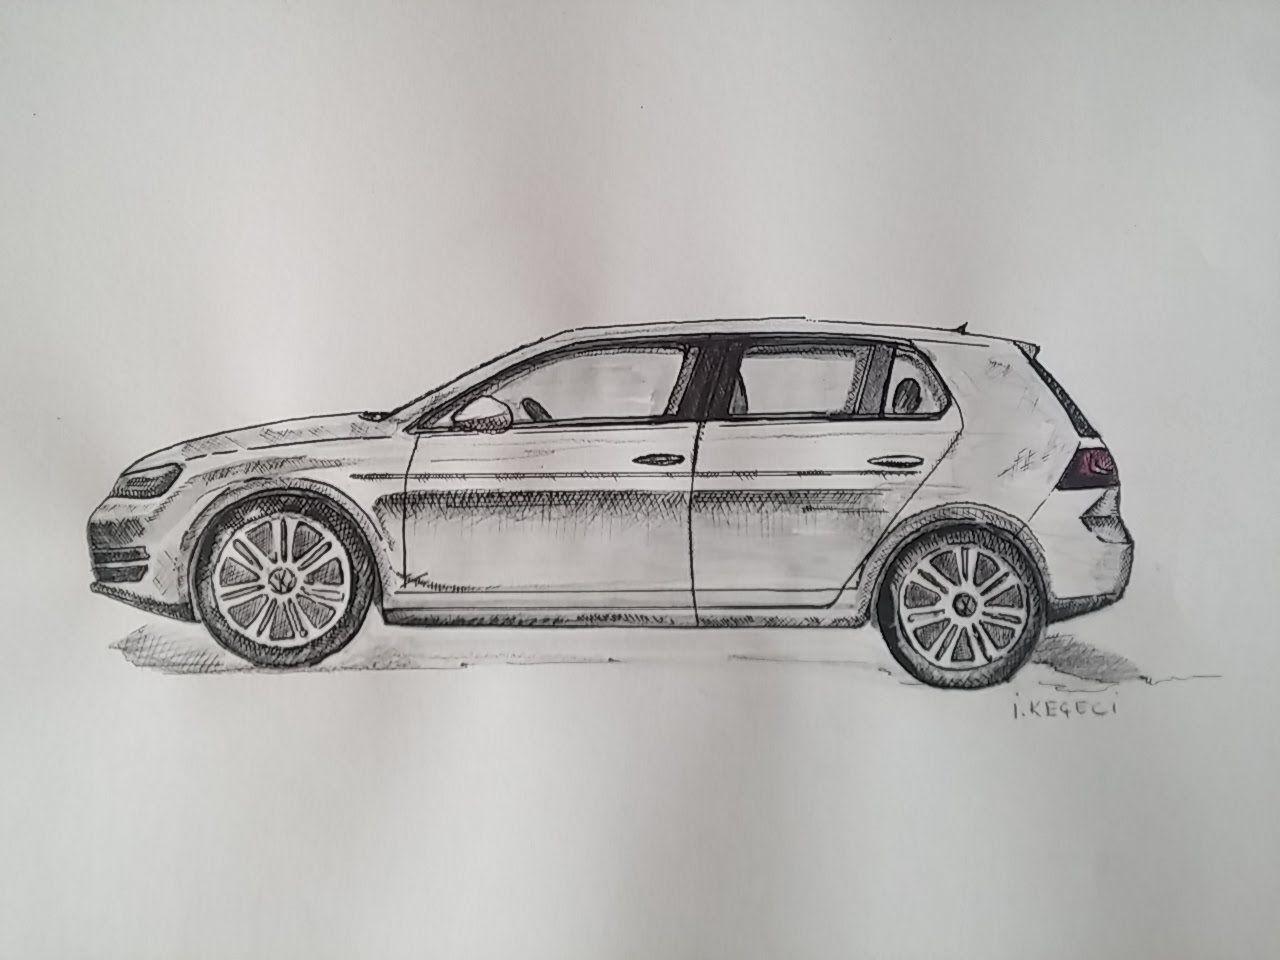 Vw Golf 7 Cizimi Timelapse Video Volkswagen Golf Volkswagen Drawings